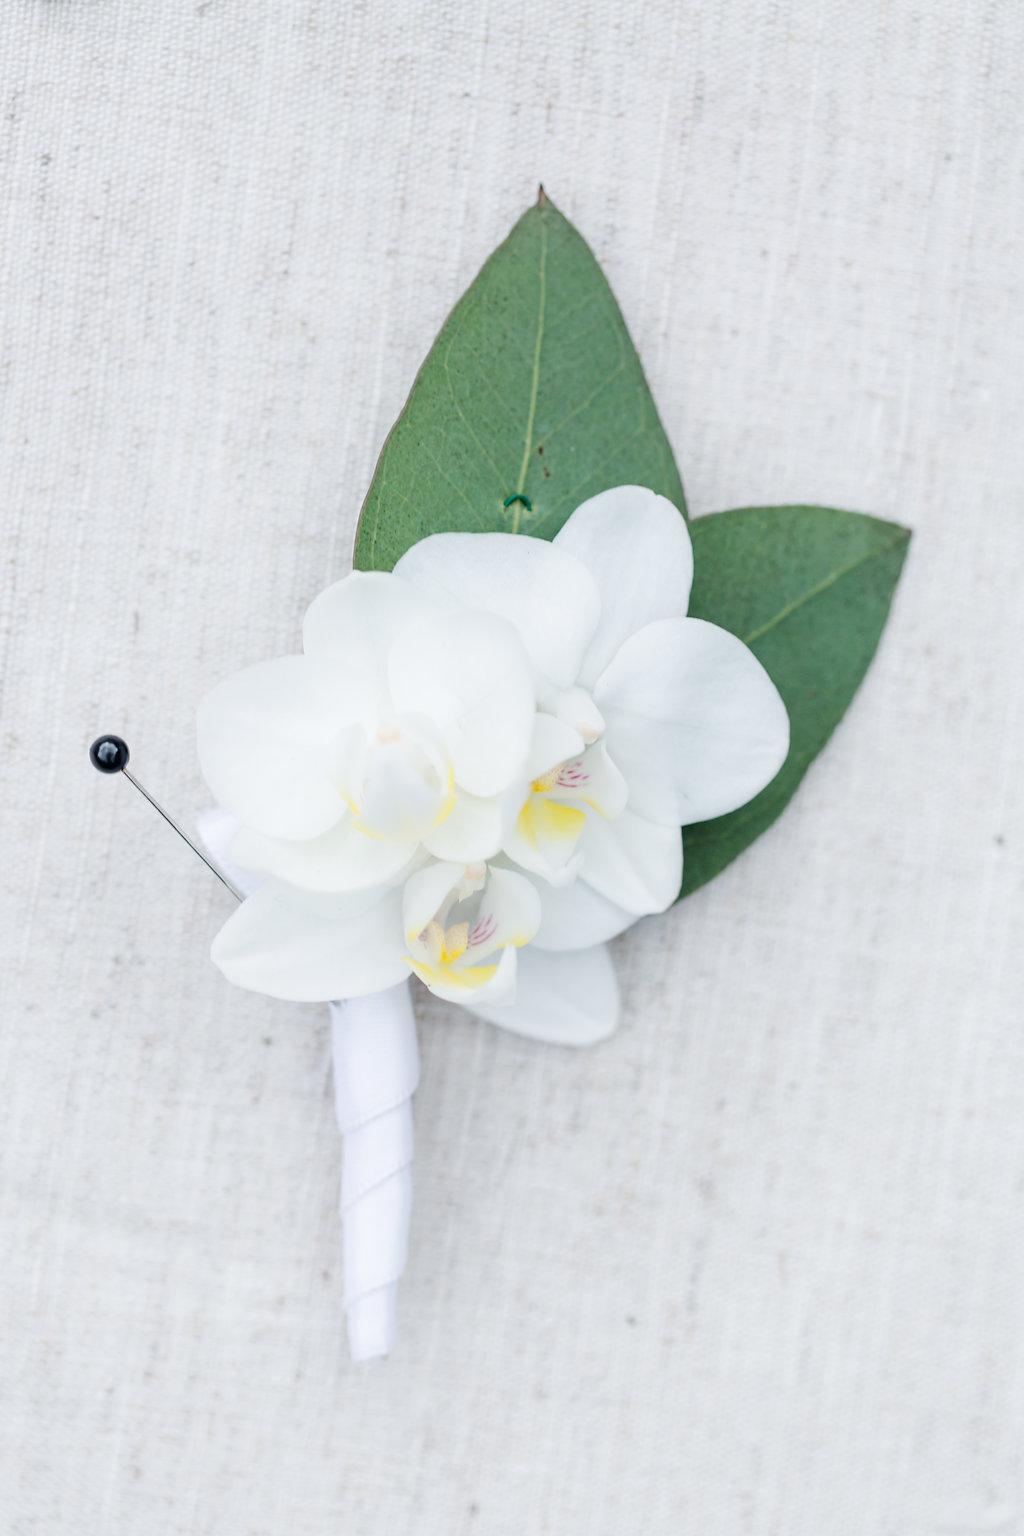 Triple mini Phaleanopsis boutonniere wrapped in ivory satin. Rachel E.H. Photography